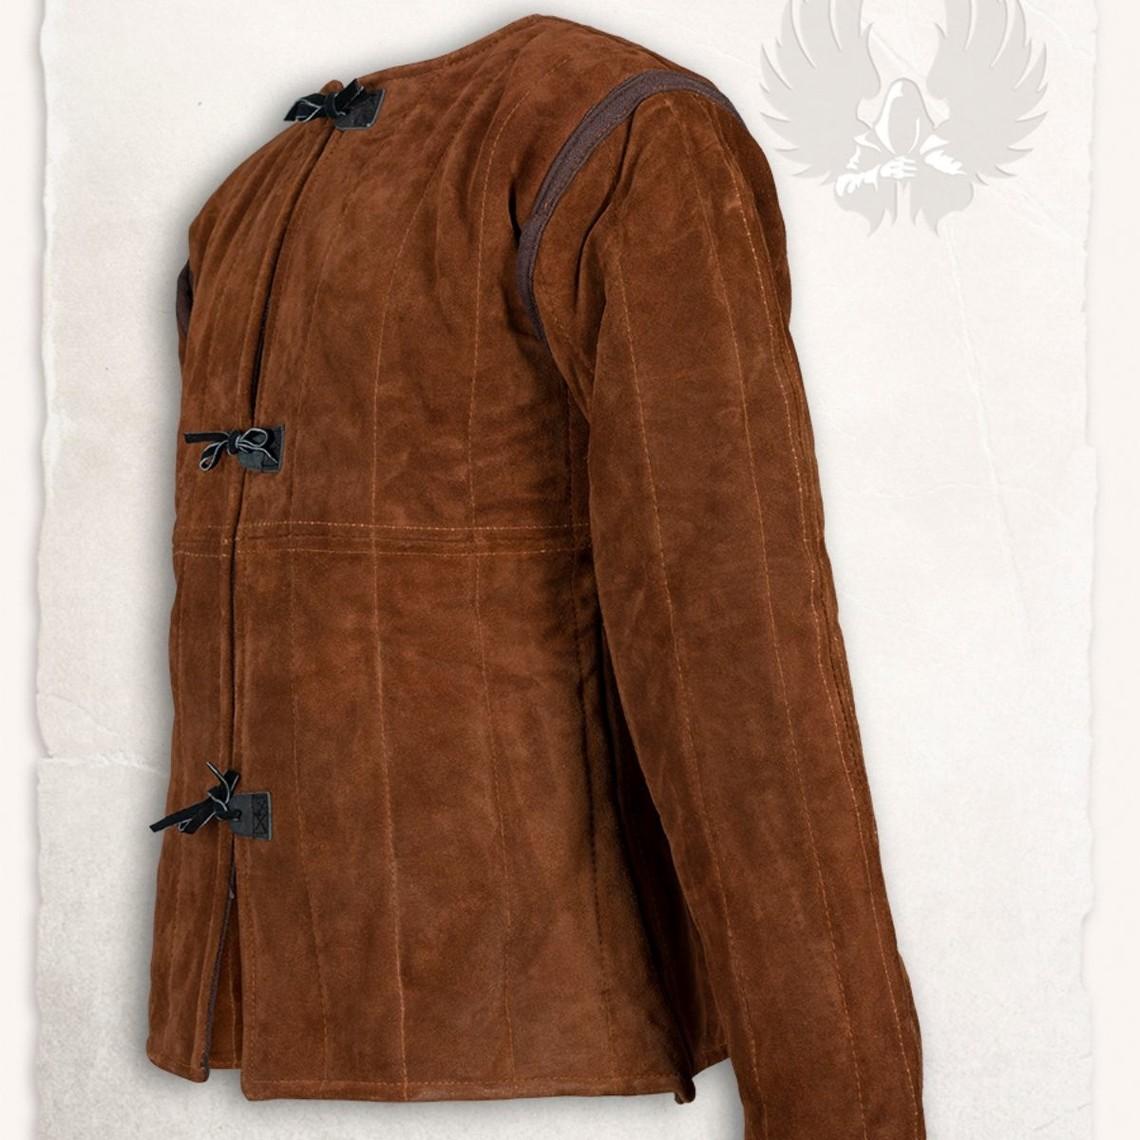 Mytholon 15a siglo gambesón Aulber gamuza marrón claro